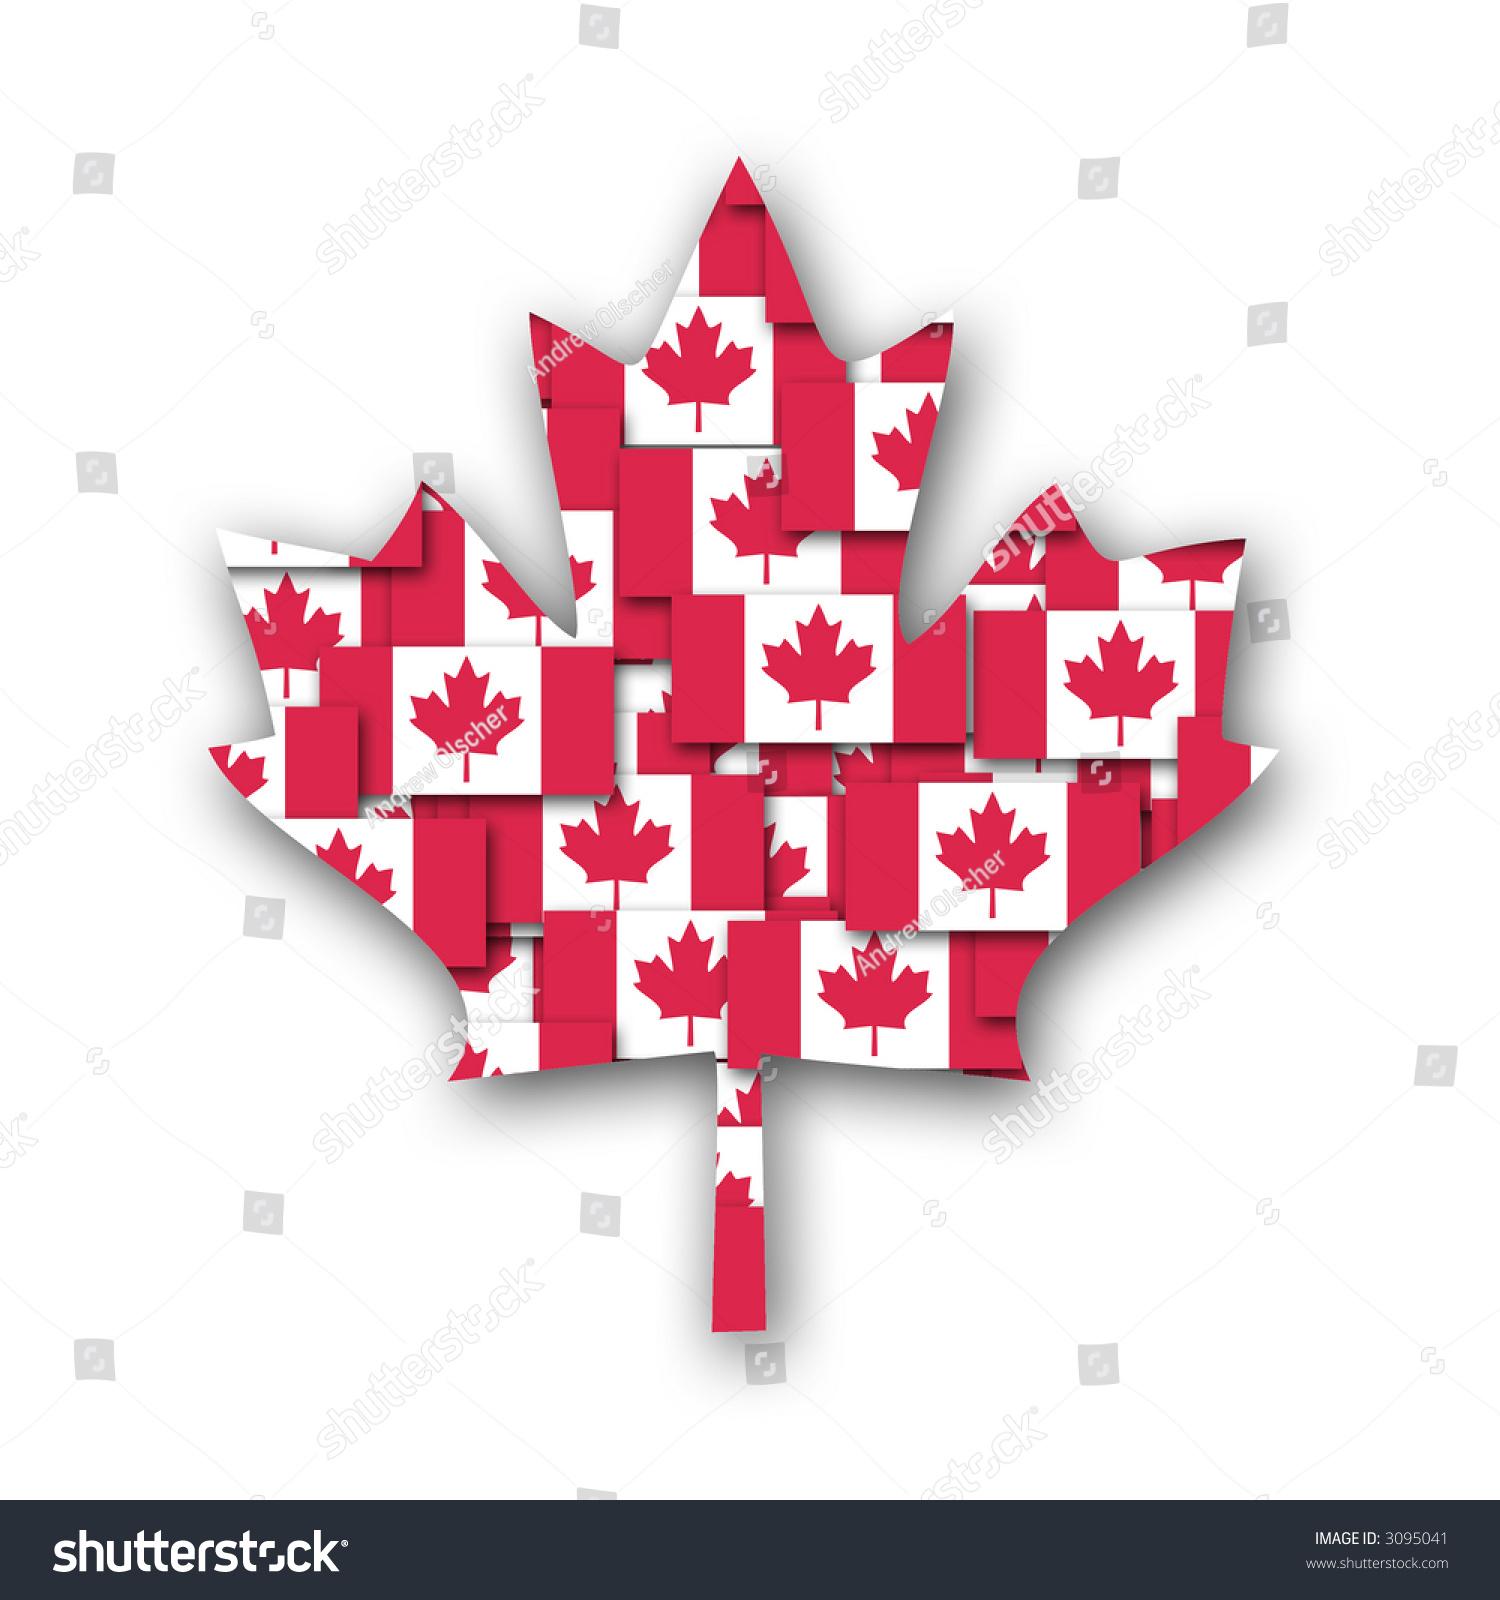 canadian maple leaf textured canadian flag stock illustration